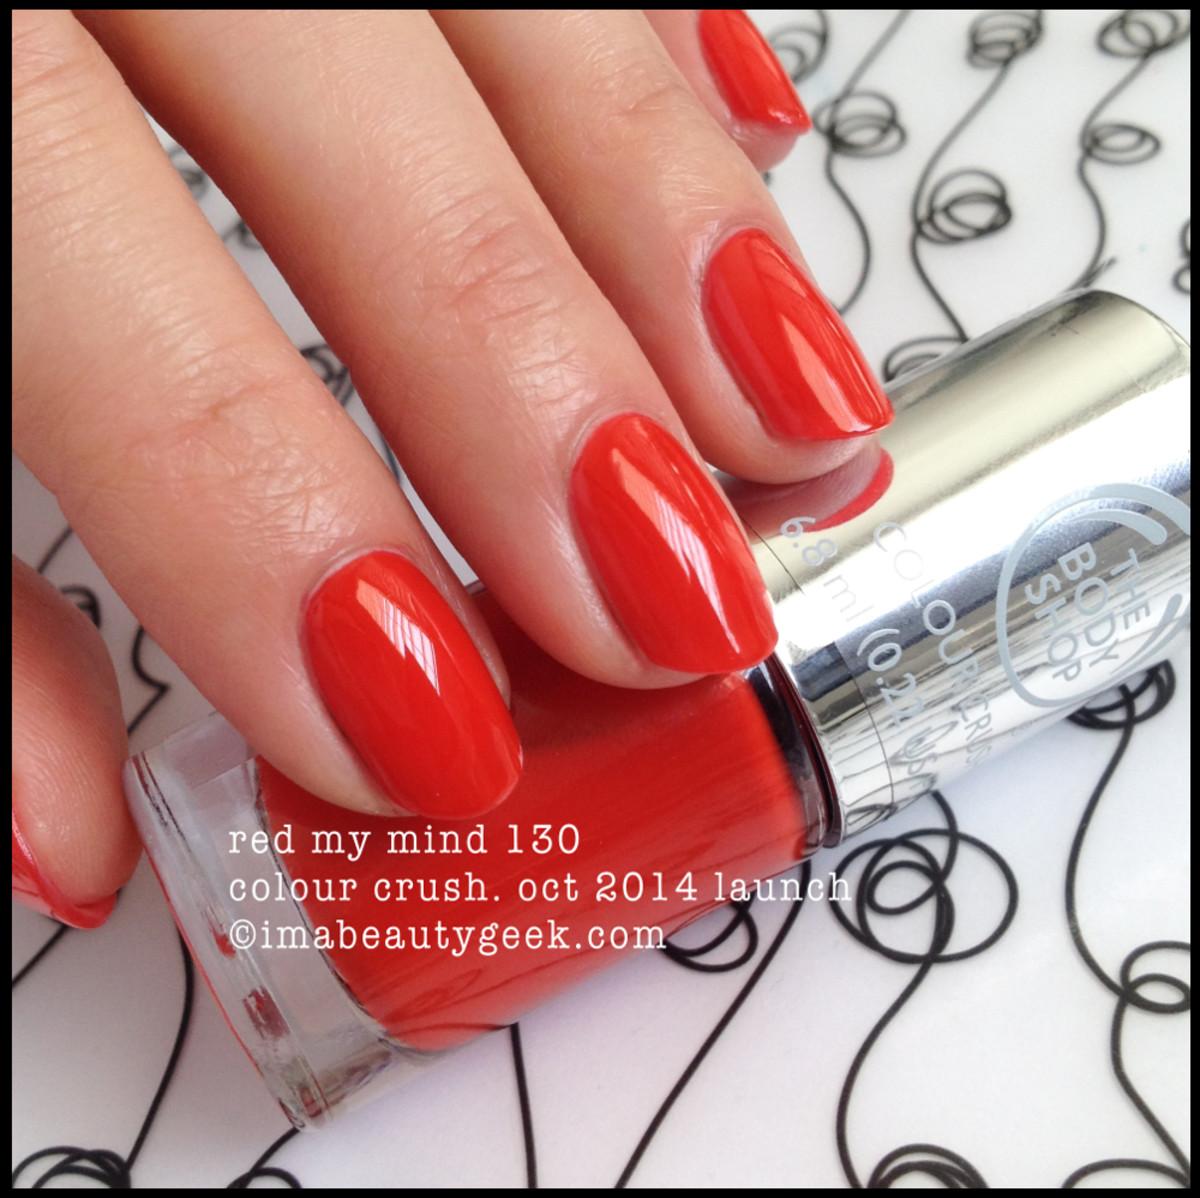 Body Shop Red My Mind 130 Colour Crush Polish